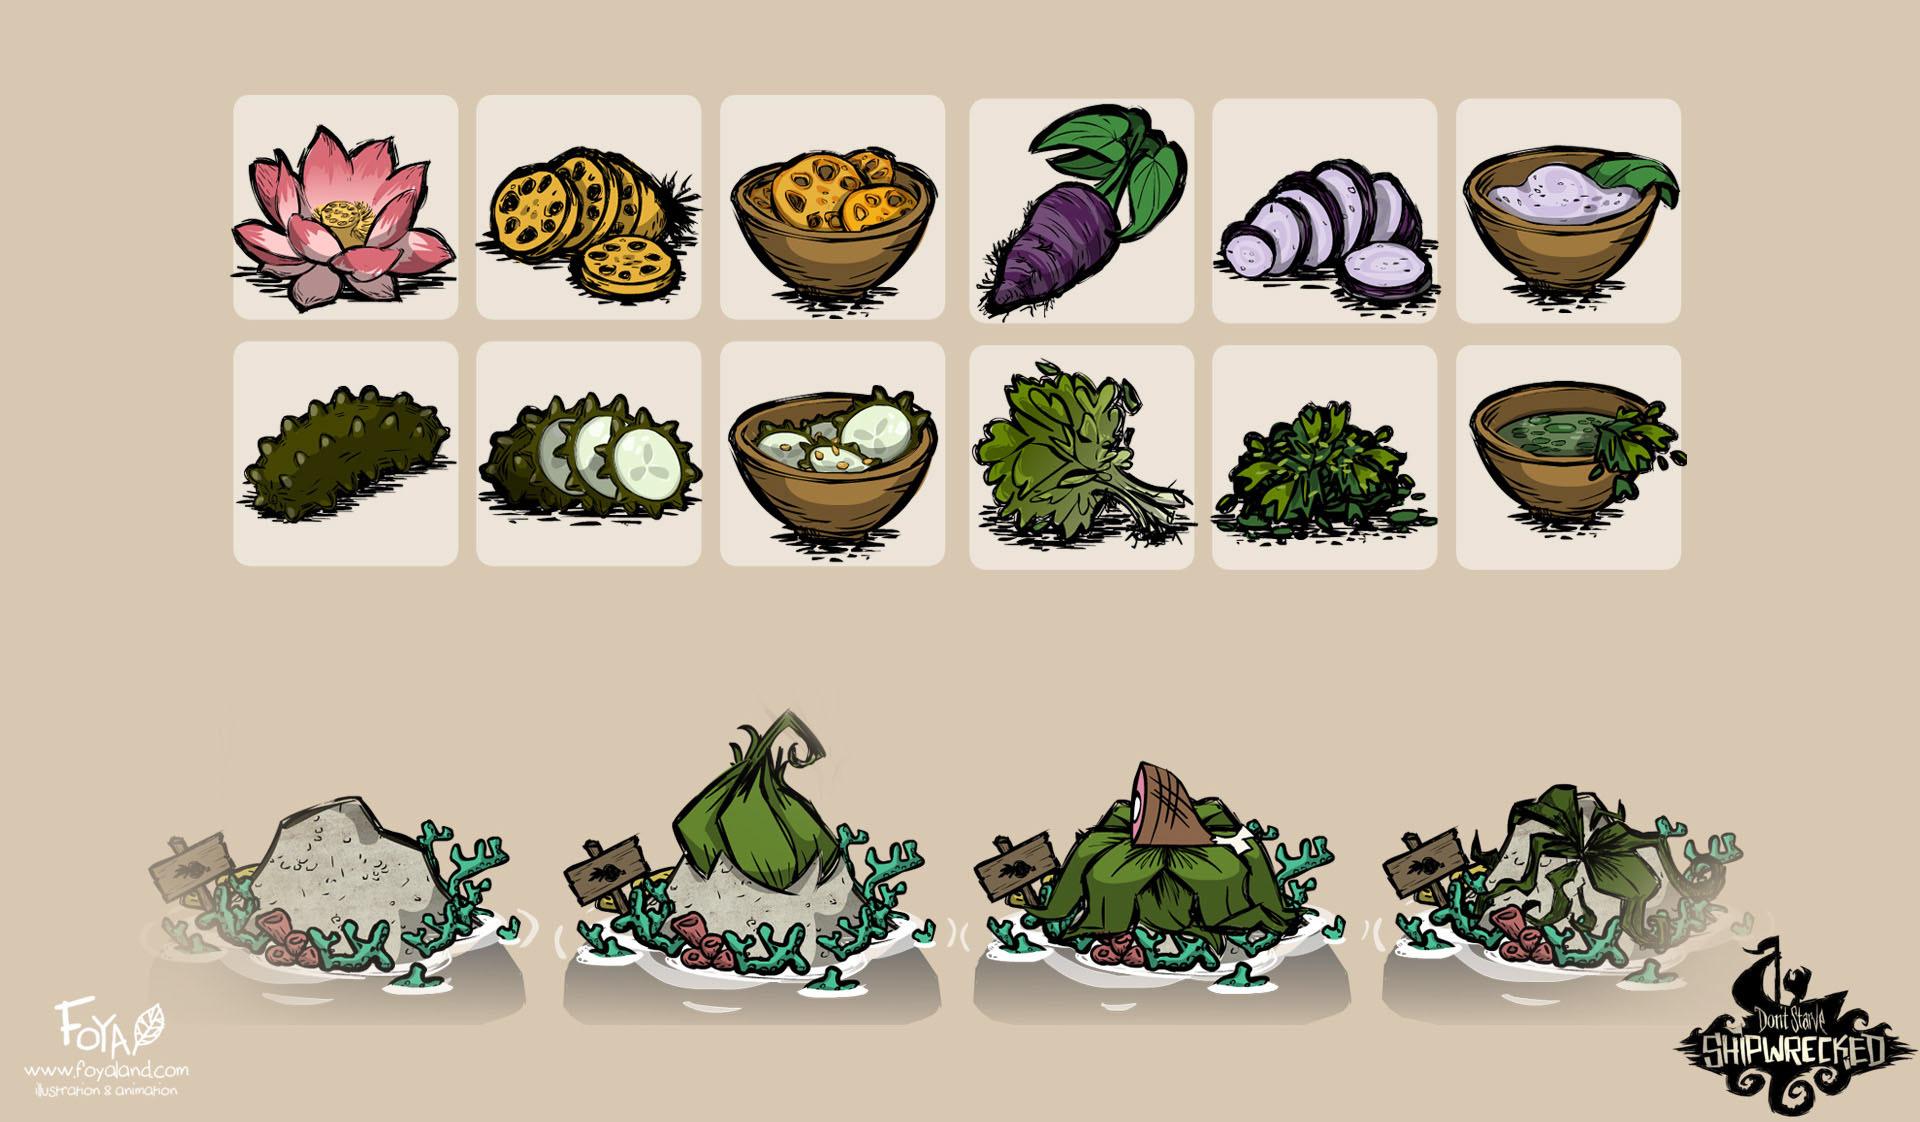 Lotus Flower Dont Starve Game Wiki Fandom Powered By Wikia